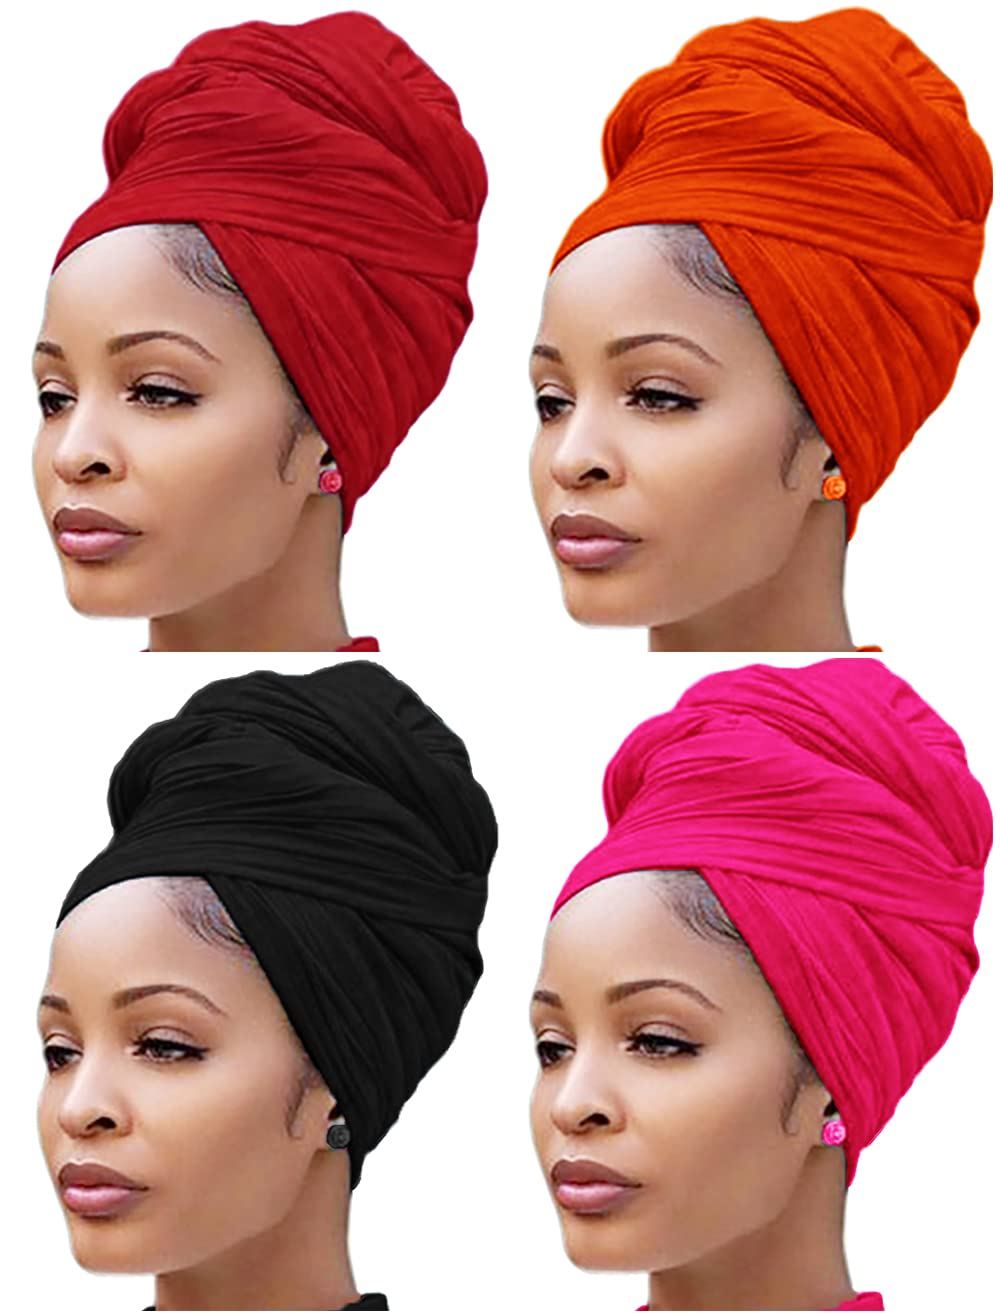 Nonbongoy 4 PCS Head Wrap Scarf Women Stretch Al sold out. Max 72% OFF Hair Tu Tshirt for